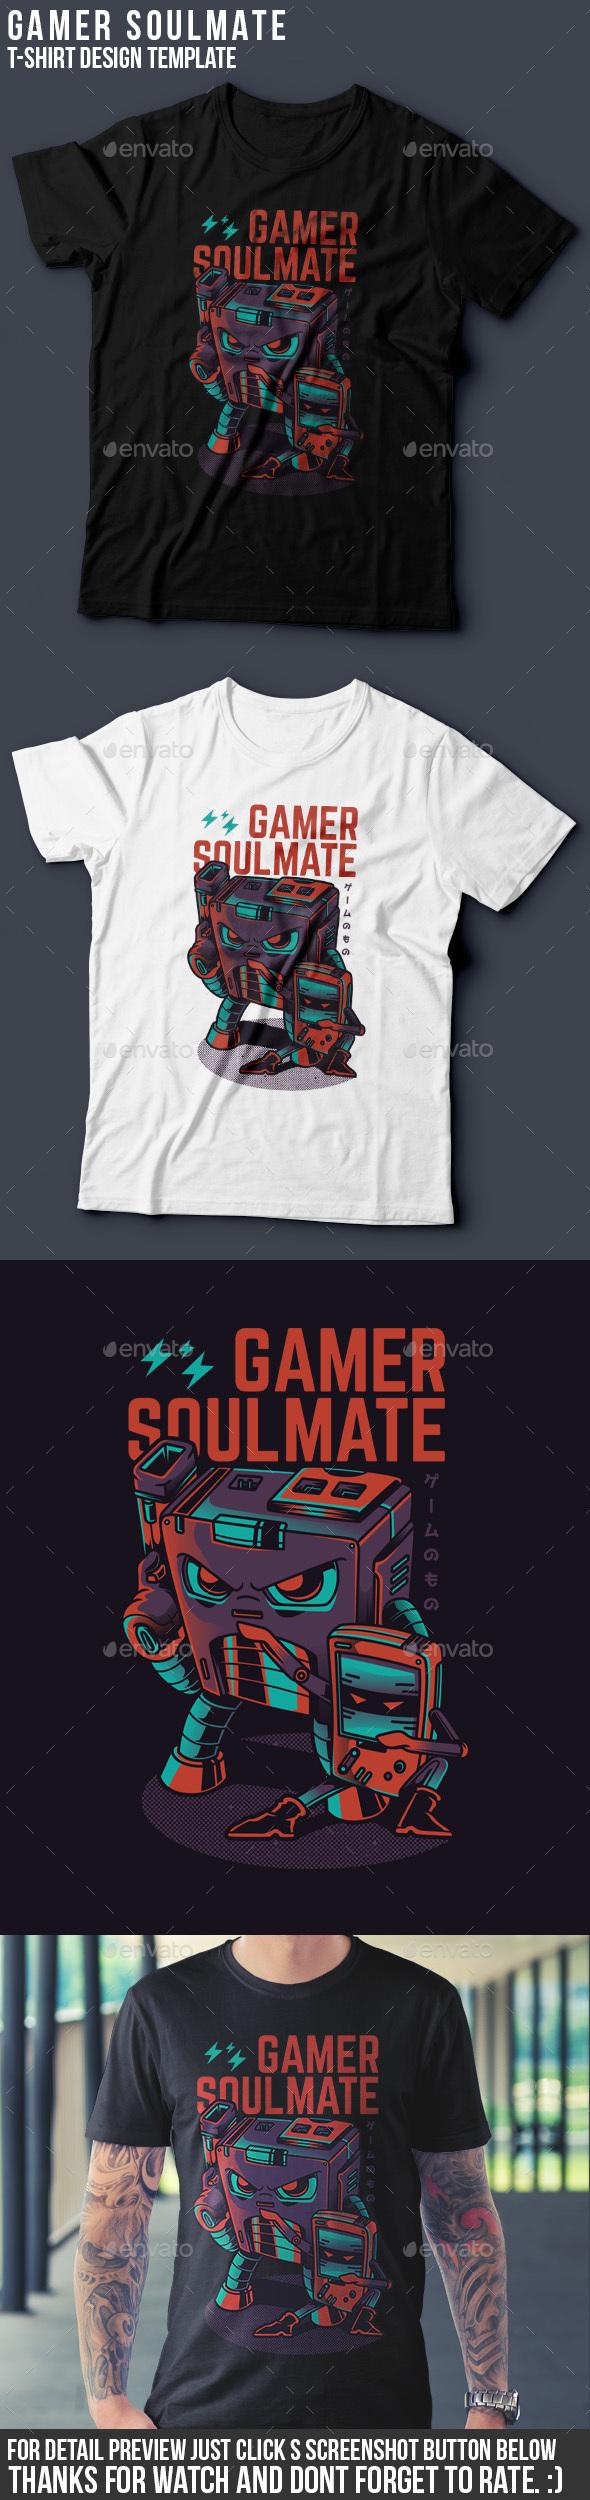 Gamer Soulmate T-Shirt Design - Funny Designs